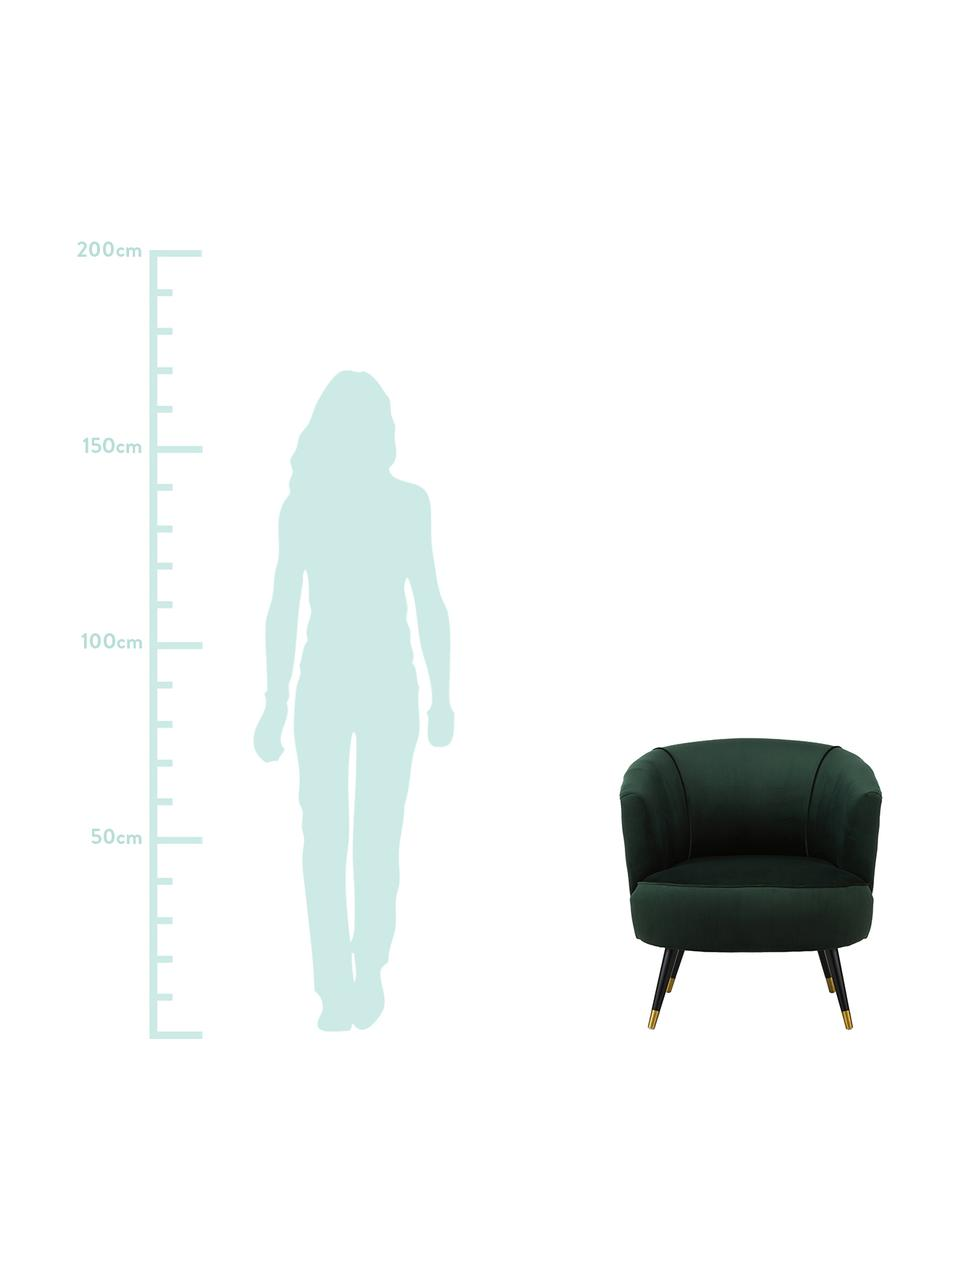 Samt-Cocktailsessel Ella in Grün, Bezug: Samt (Polyester) Der hoch, Füße: Metall, lackiert, Samt Dunkelgrün, B 74 x T 78 cm